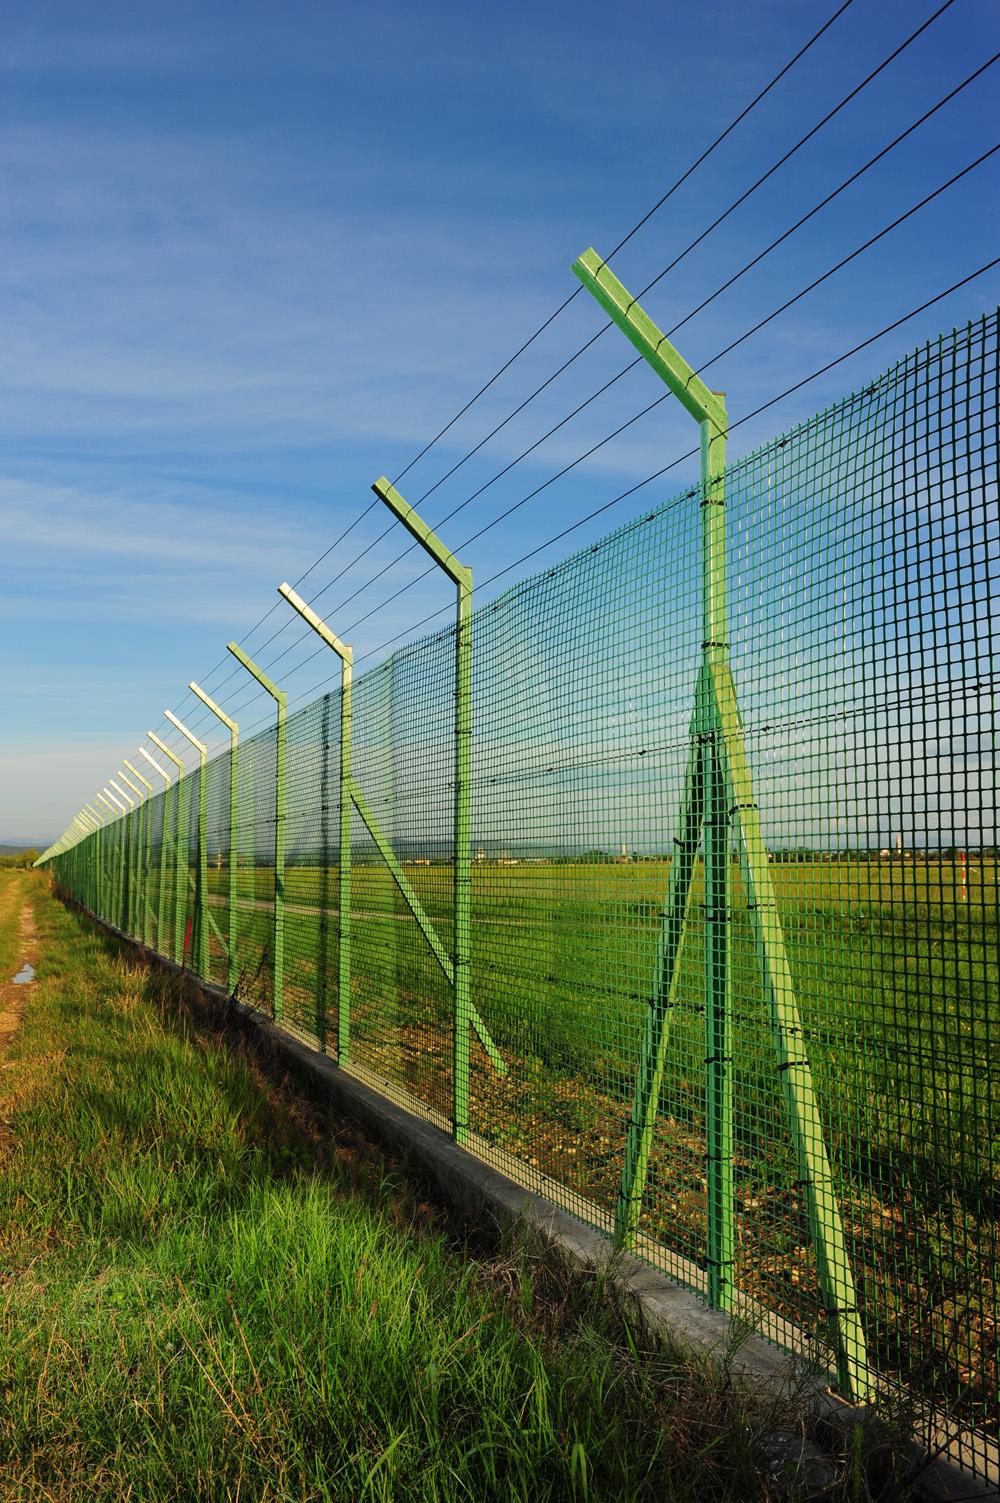 airport-fibre-fence-mesh-13